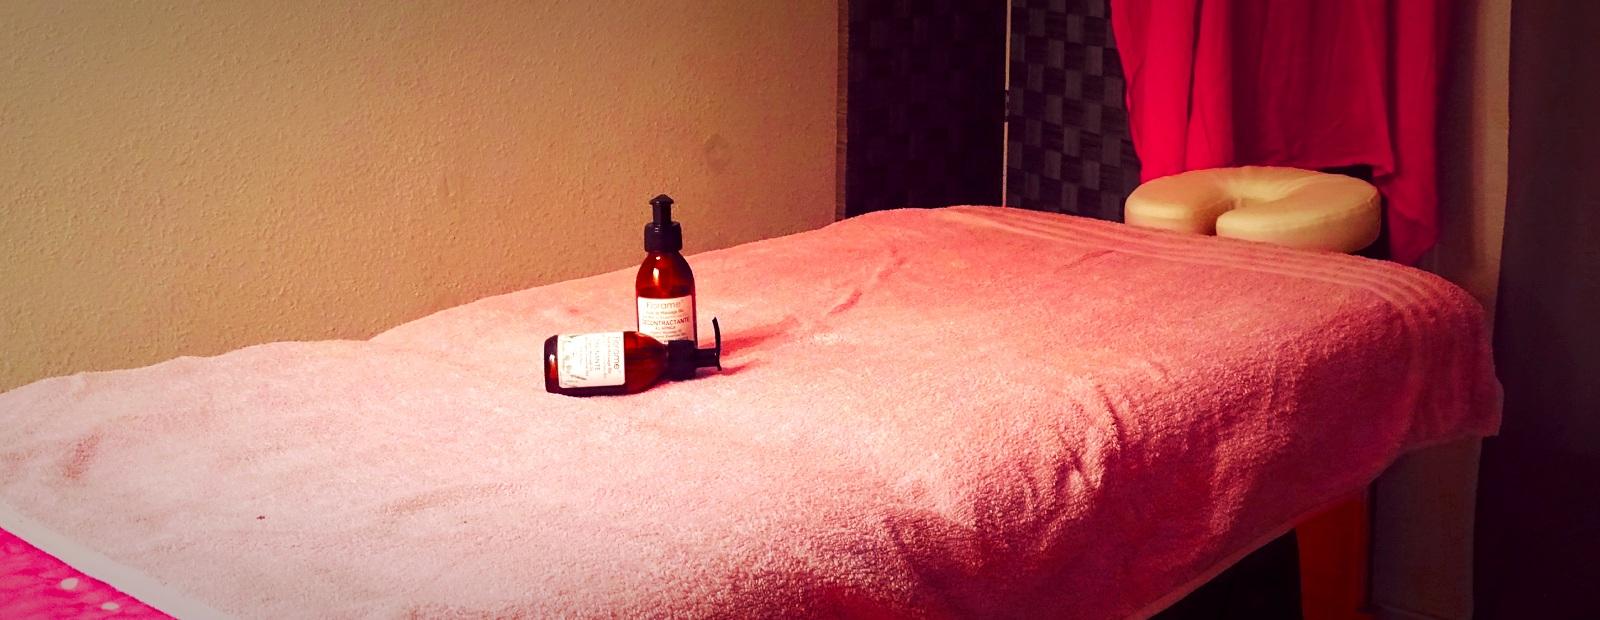 Naturoil Pertuis Massage Californien Suedois